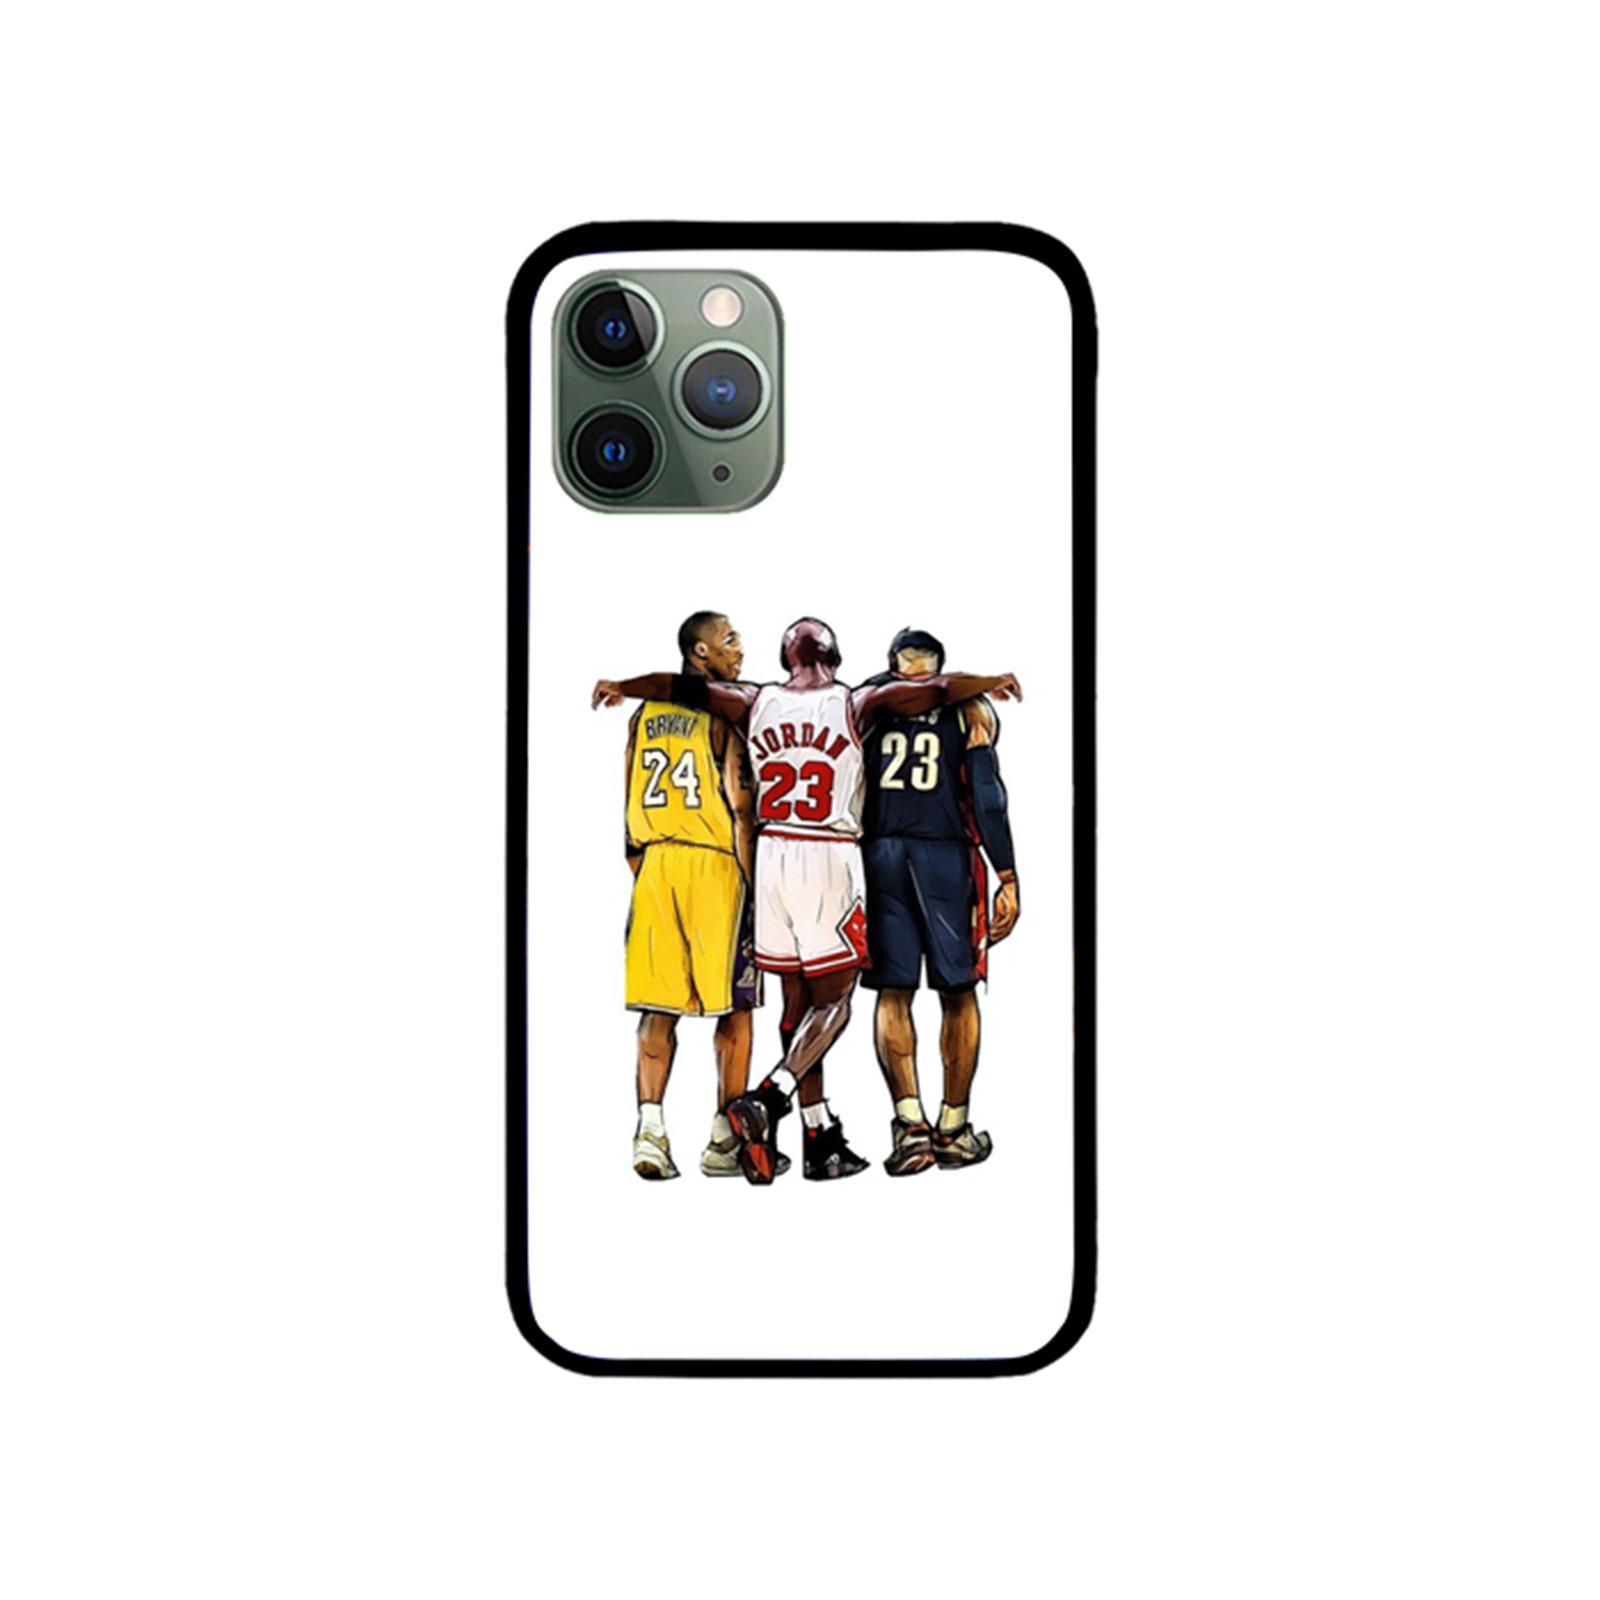 ciervo Hacia arriba despierta  Kobe Bryant x Michael Jordan x Lebron James The Greatest of All Time iPhone  Case 11,X,XS,XR,8,7,6 and More | Ferolos.com